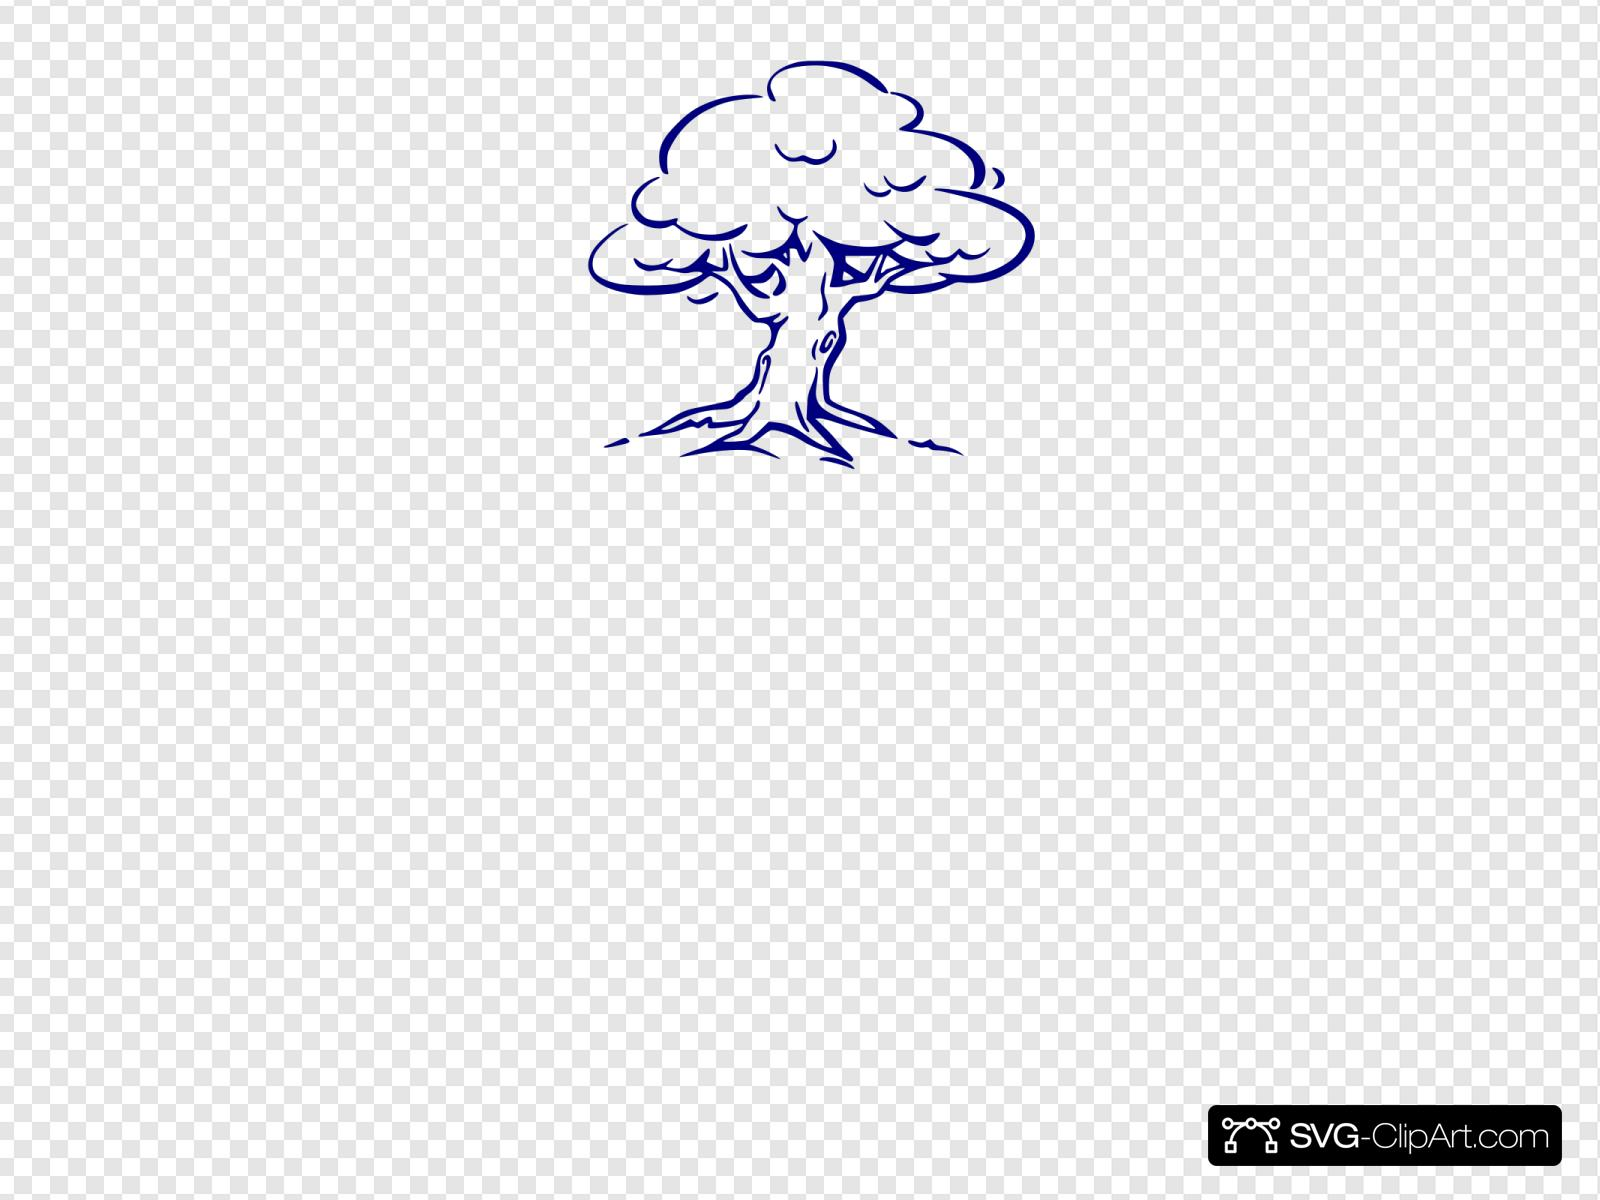 Family Tree Blue Svg Vector Family Tree Blue Clip Art Svg Clipart